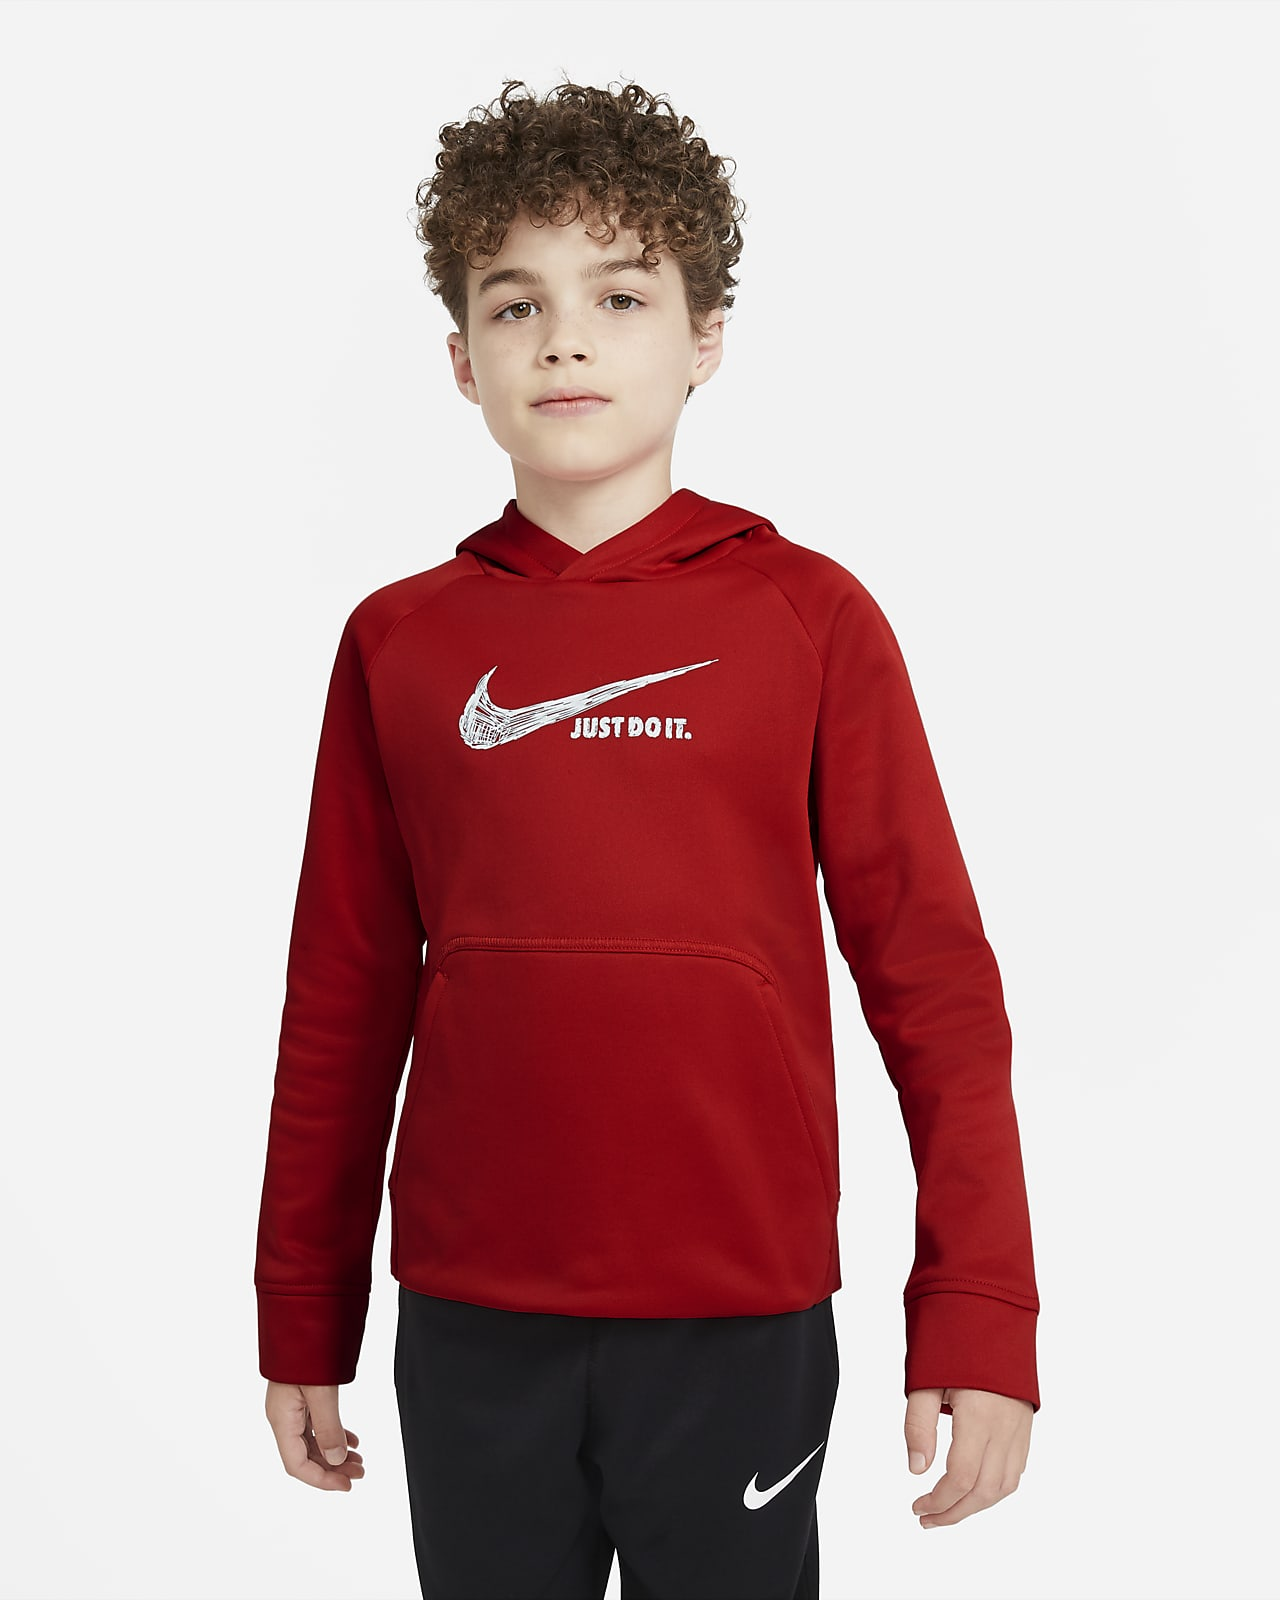 Nike Therma Big Kids' (Boys') Graphic Pullover Hoodie